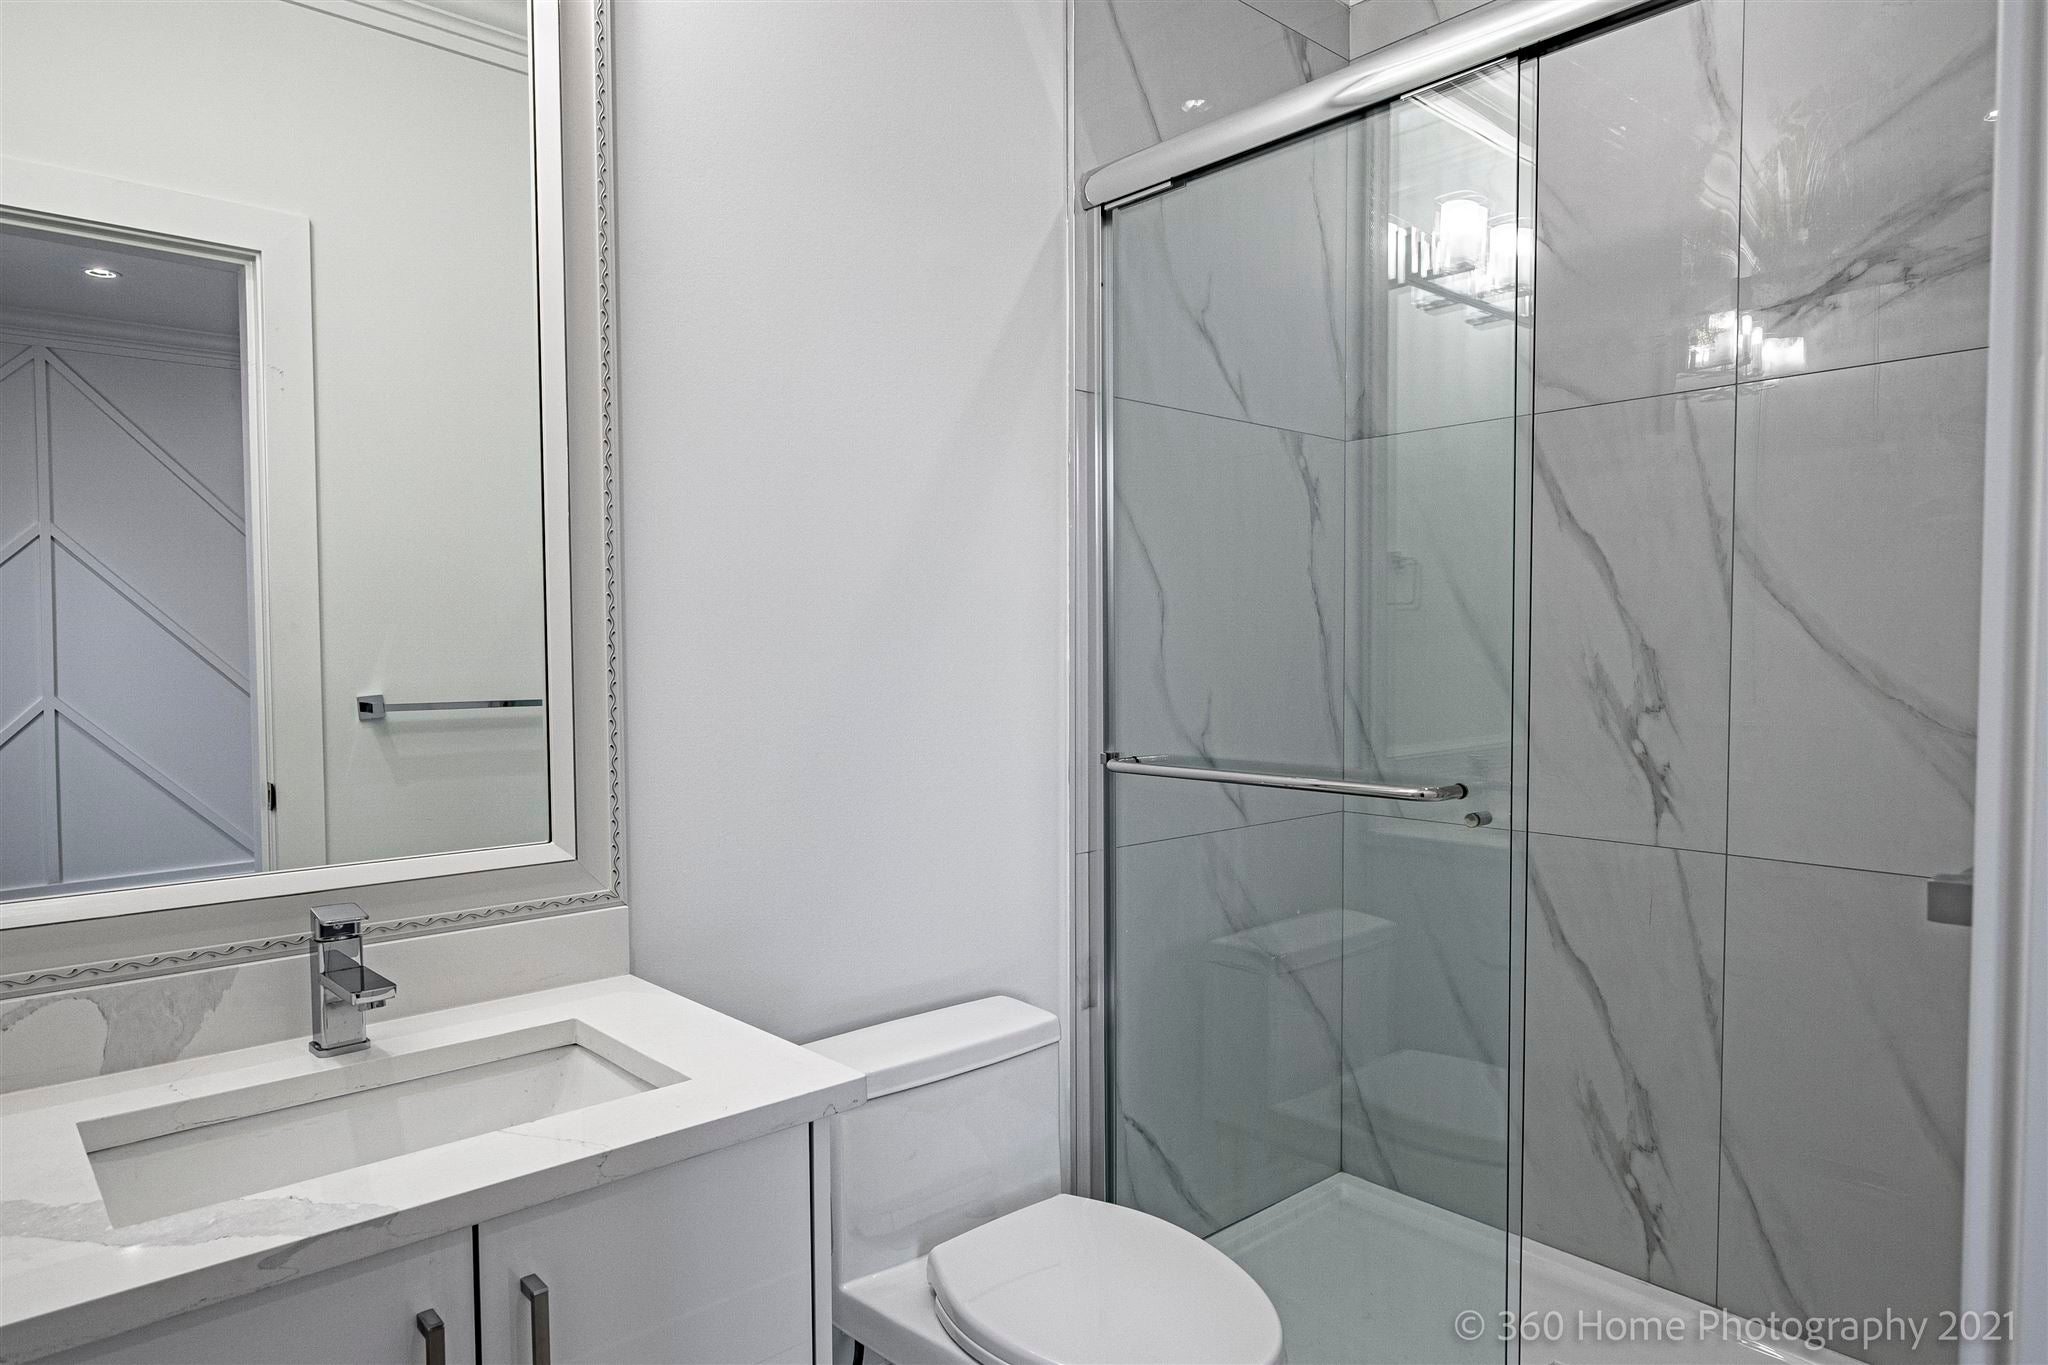 13050 101B AVENUE - Cedar Hills House/Single Family for sale, 5 Bedrooms (R2602208) - #16